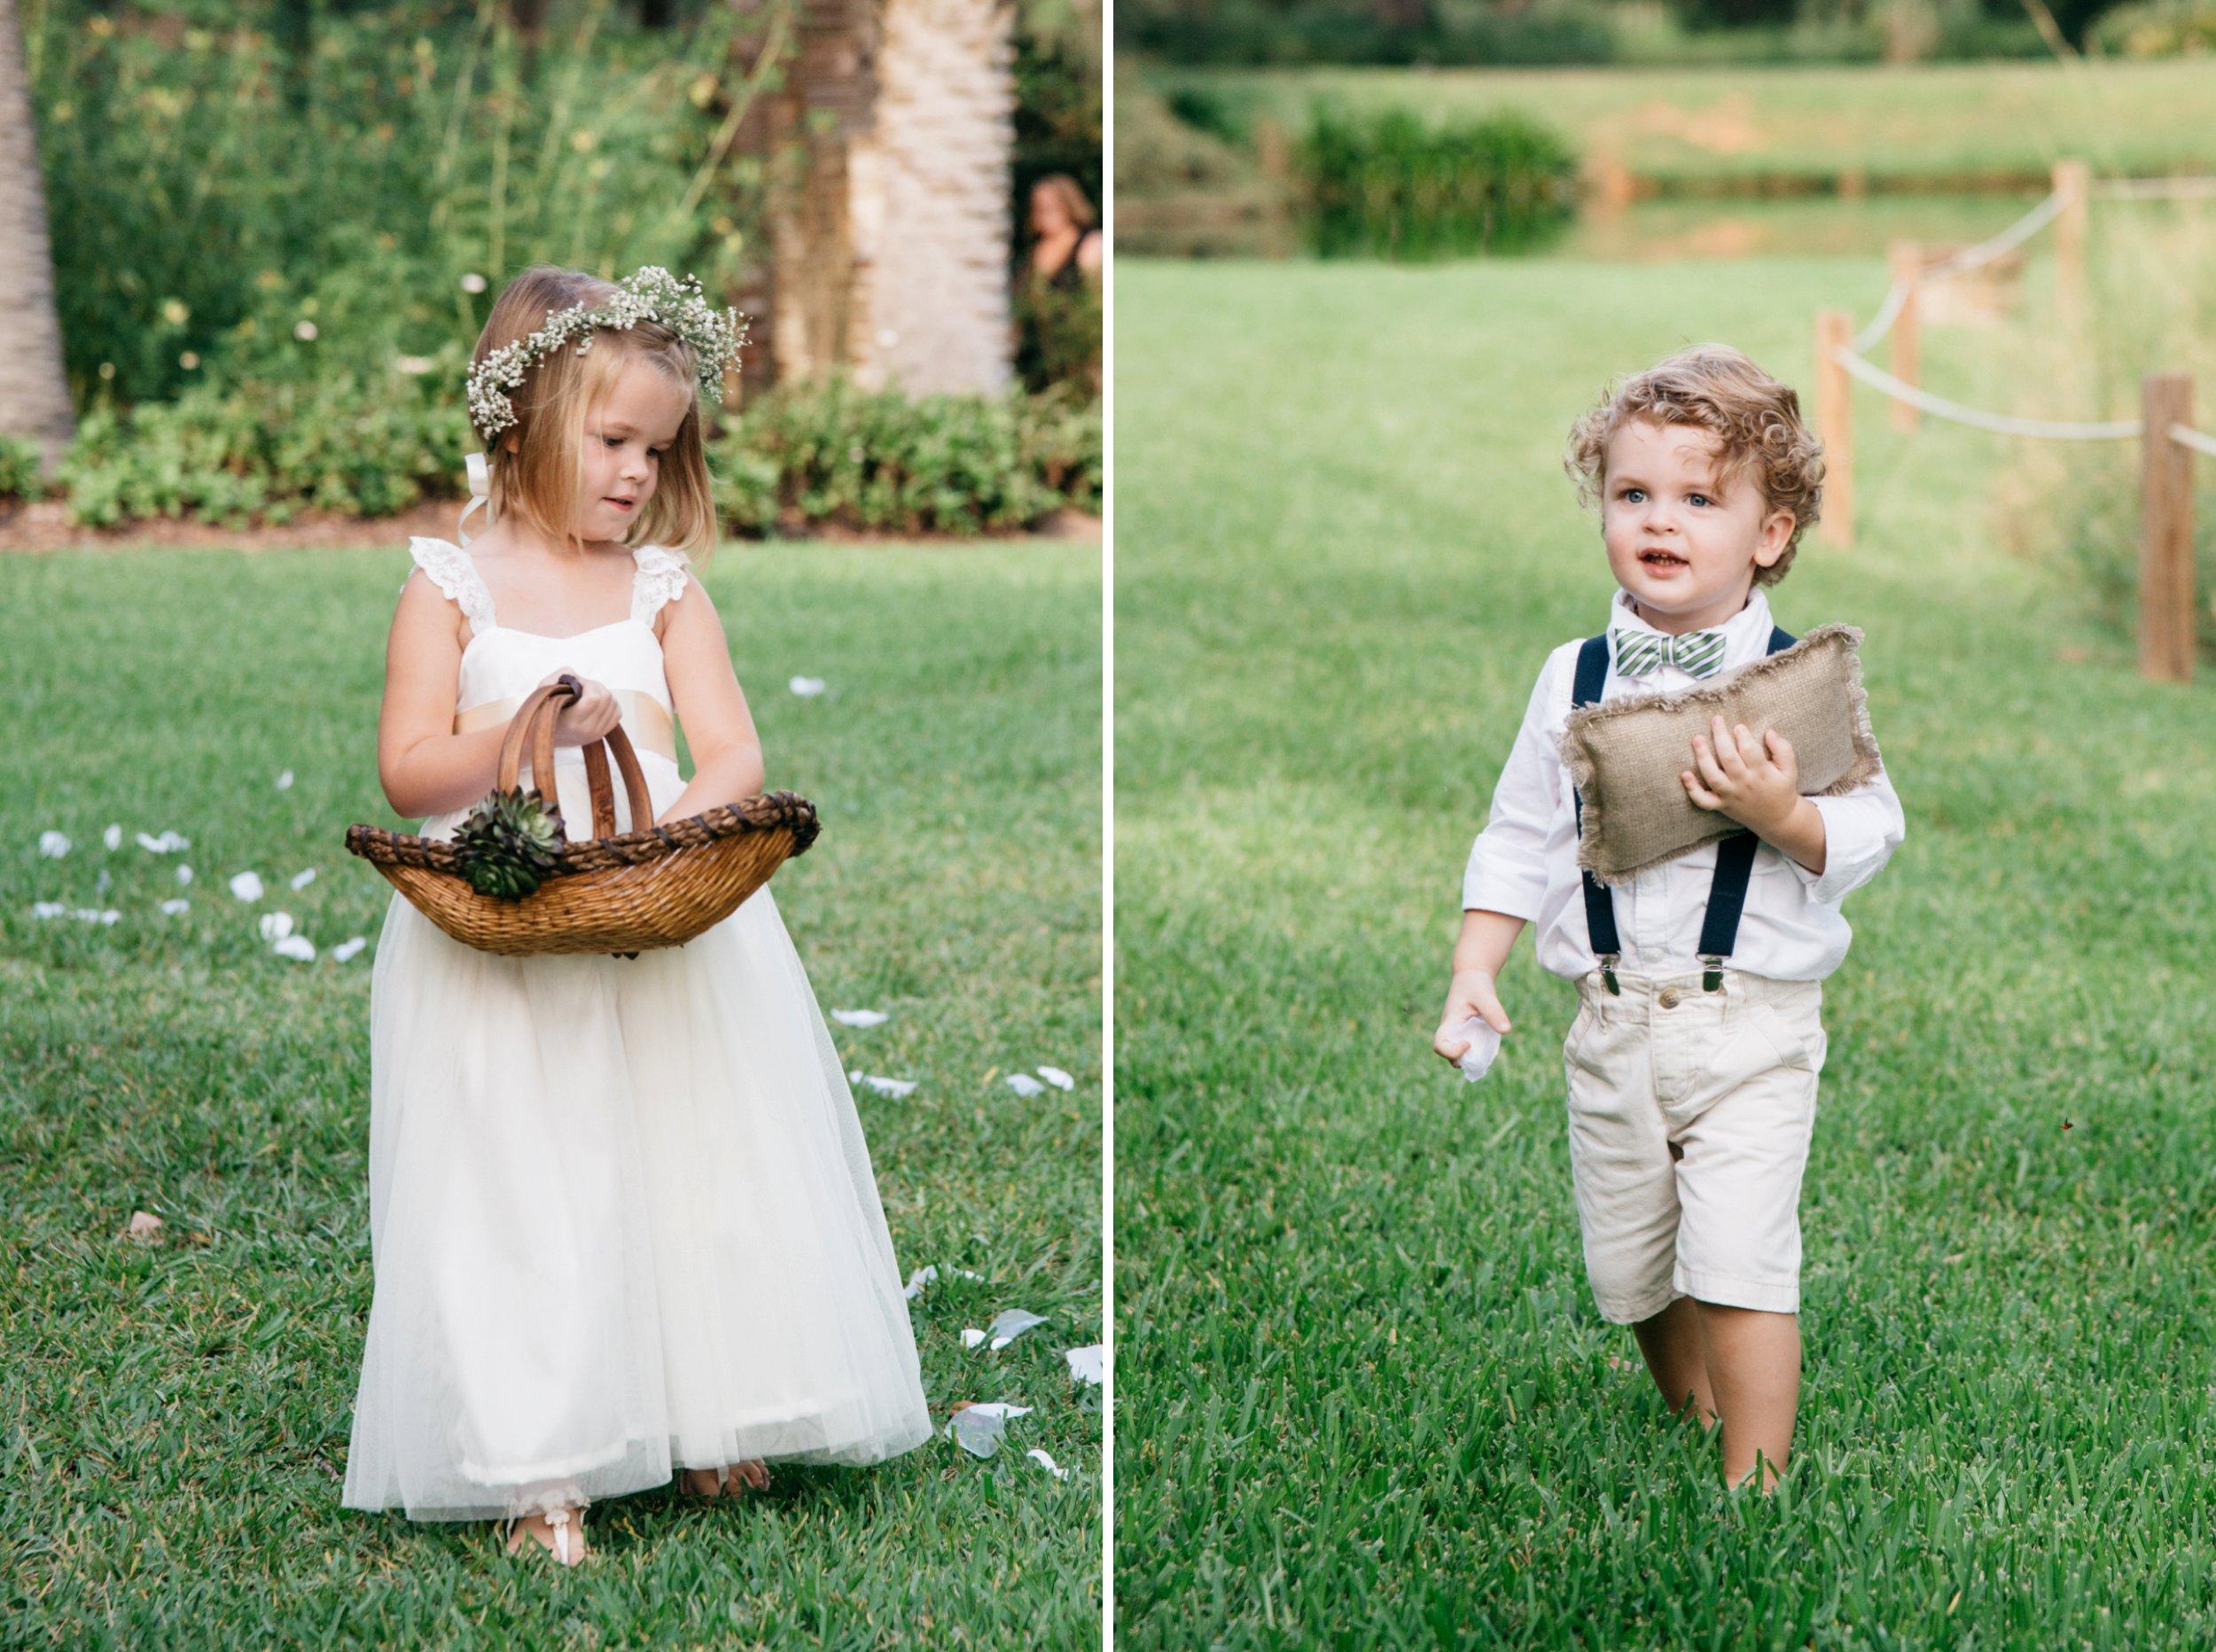 mepkin-abbey-wedding-16.jpg